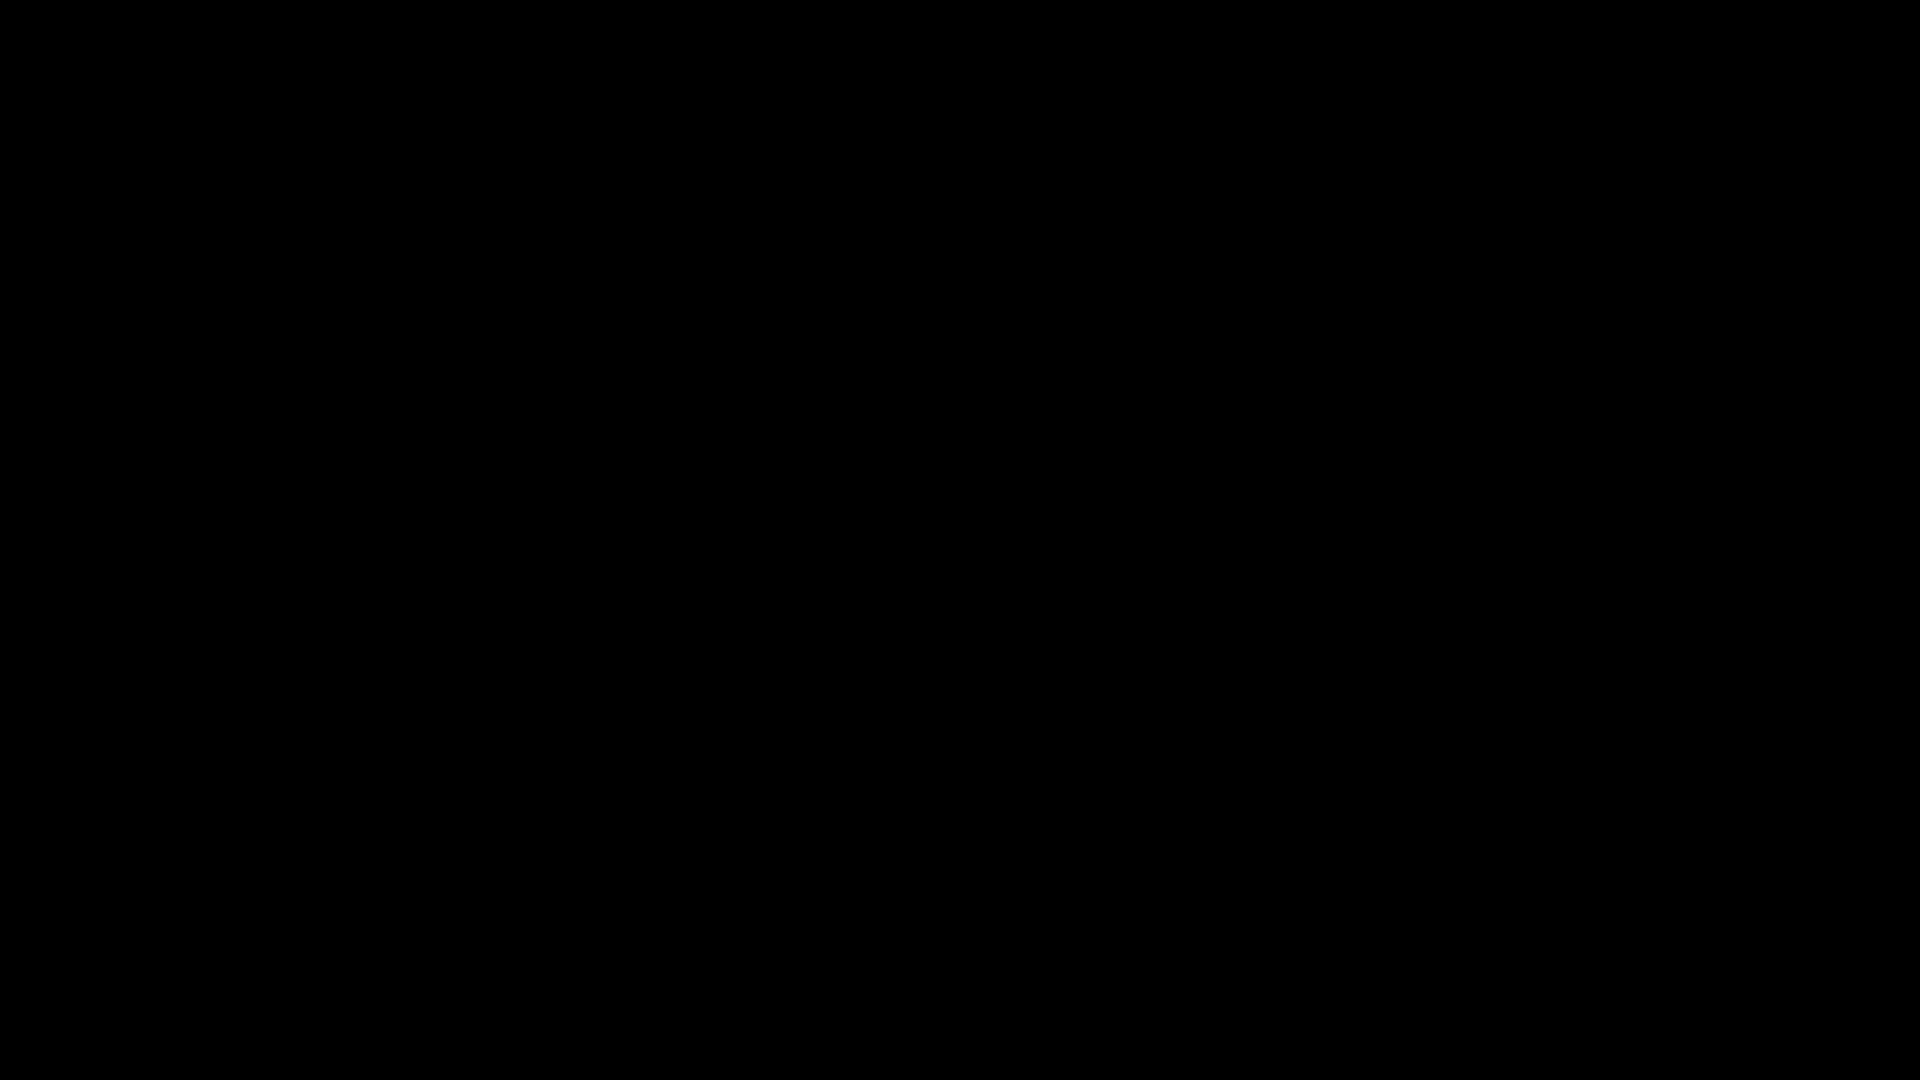 rADIANCe2